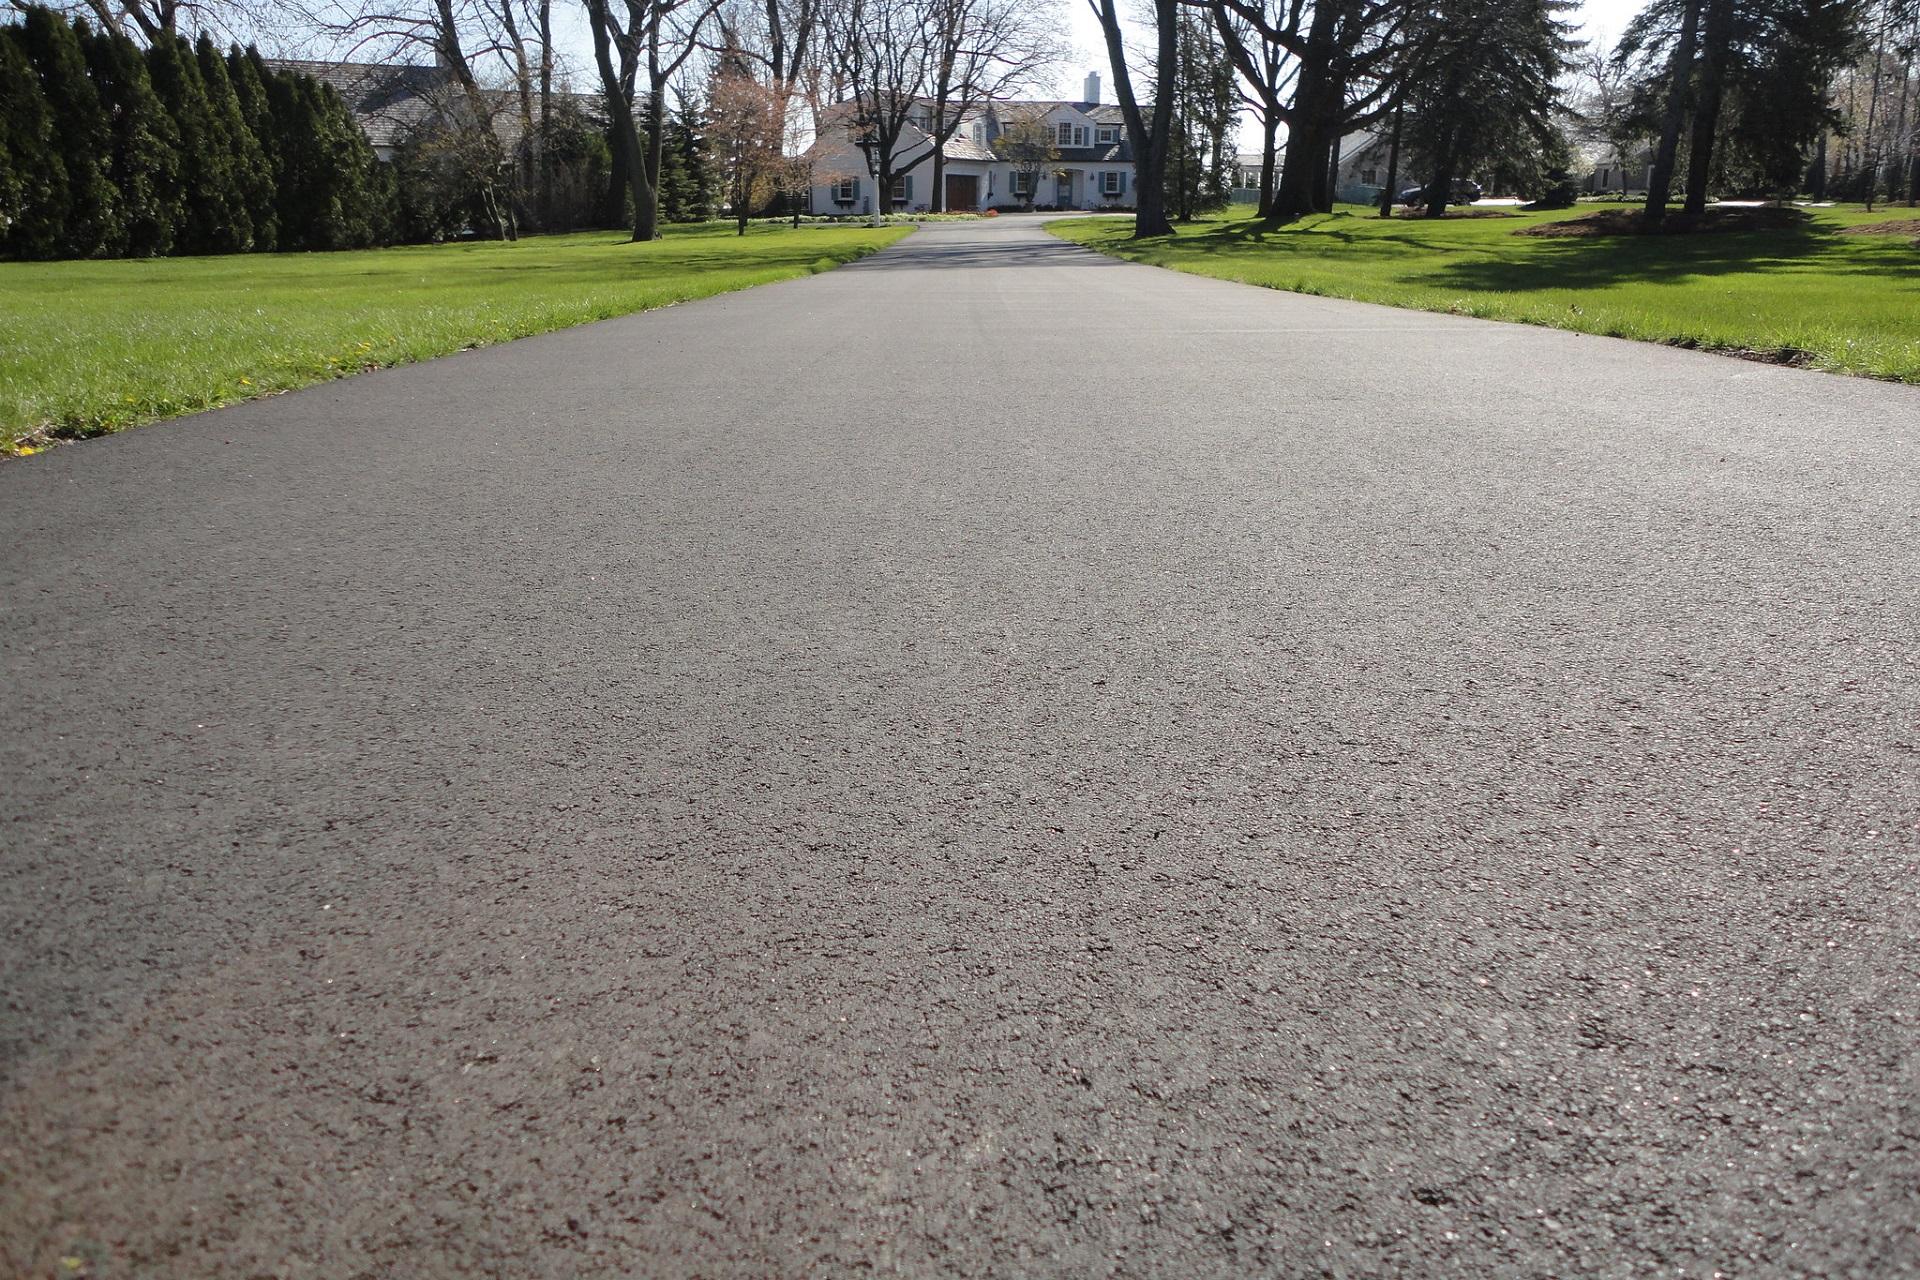 Residential Asphalt, Milwaukee Asphalt, Driveway Paving, paving, Asphalt paving, Blacktop